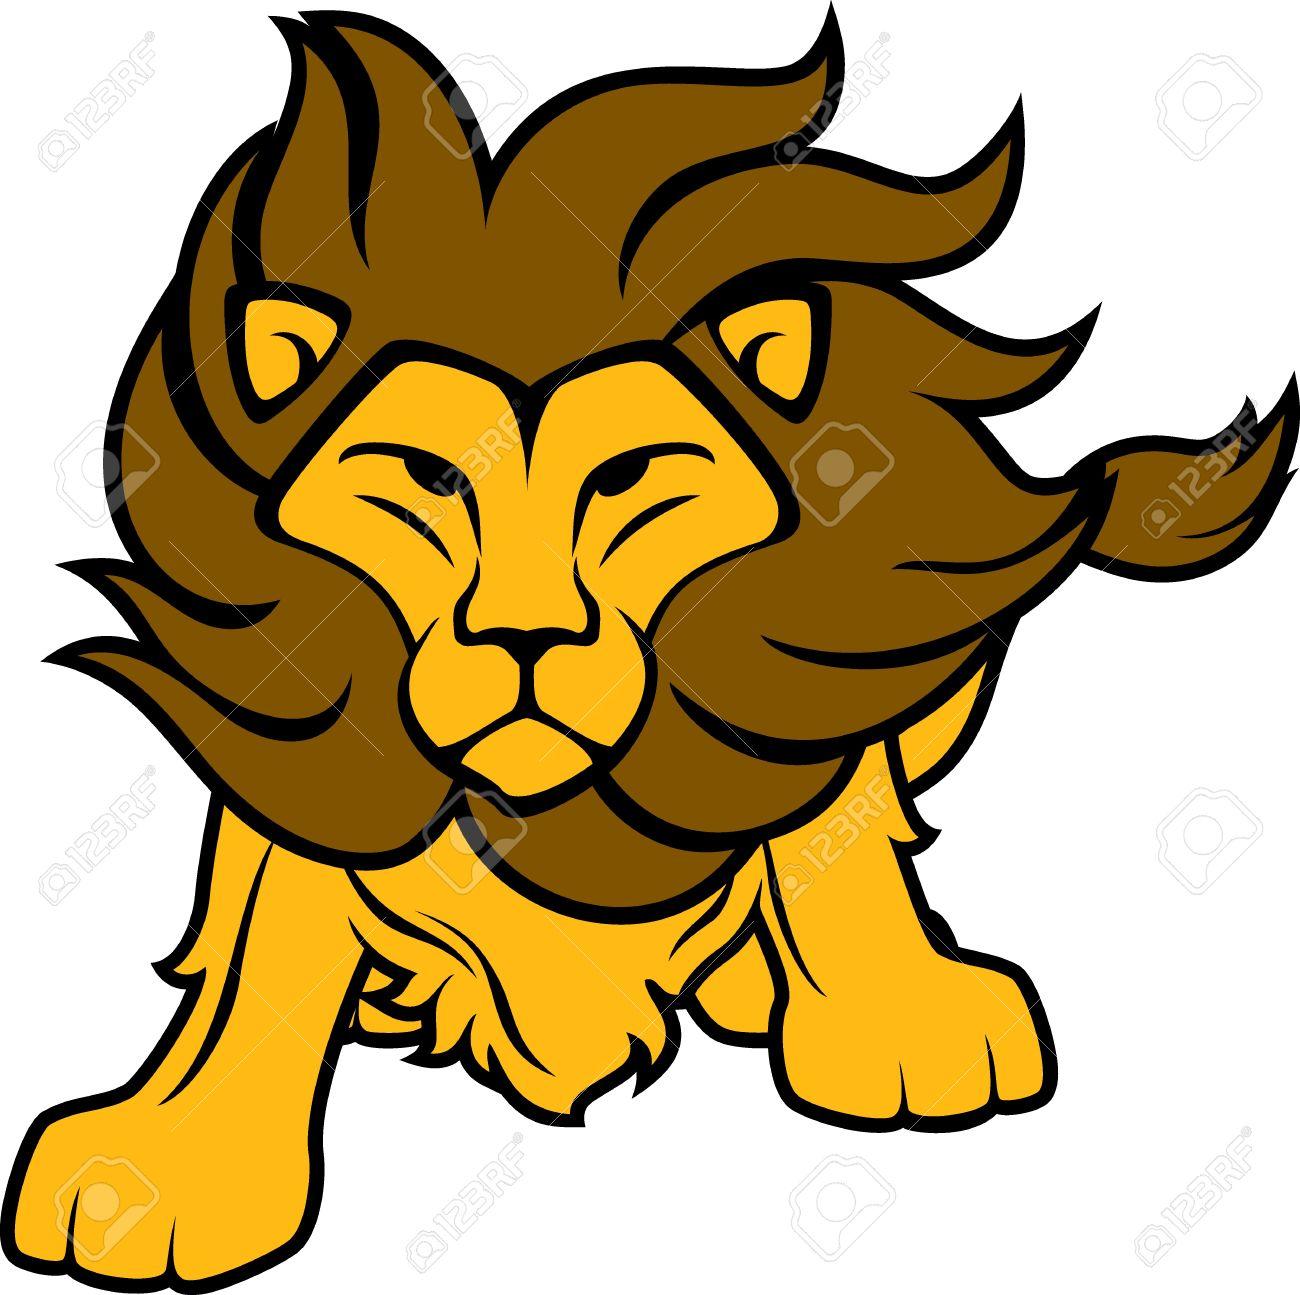 1300x1295 Lion Clipart Easy